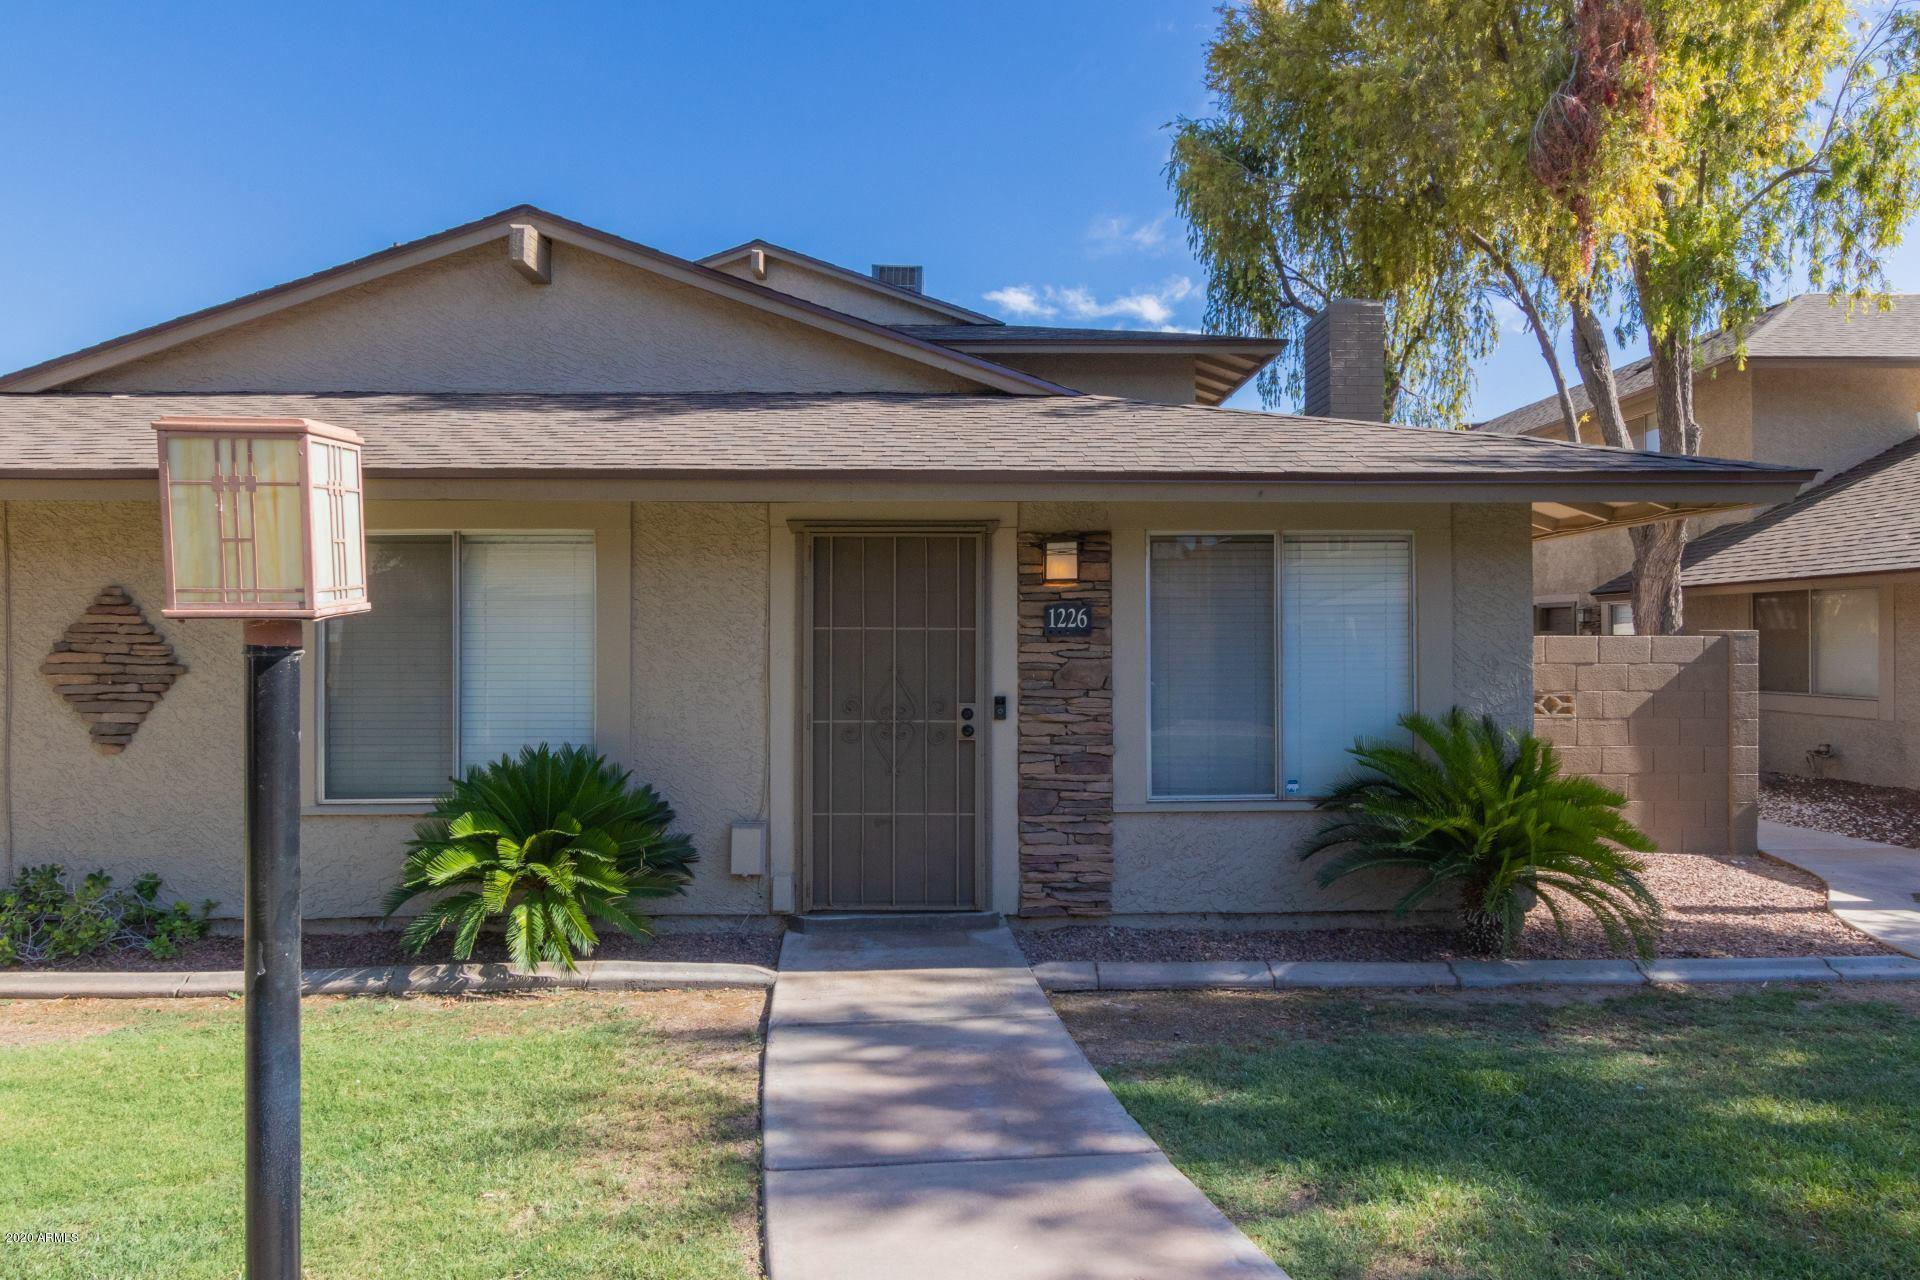 Photo of 1226 N 85TH Place, Scottsdale, AZ 85257